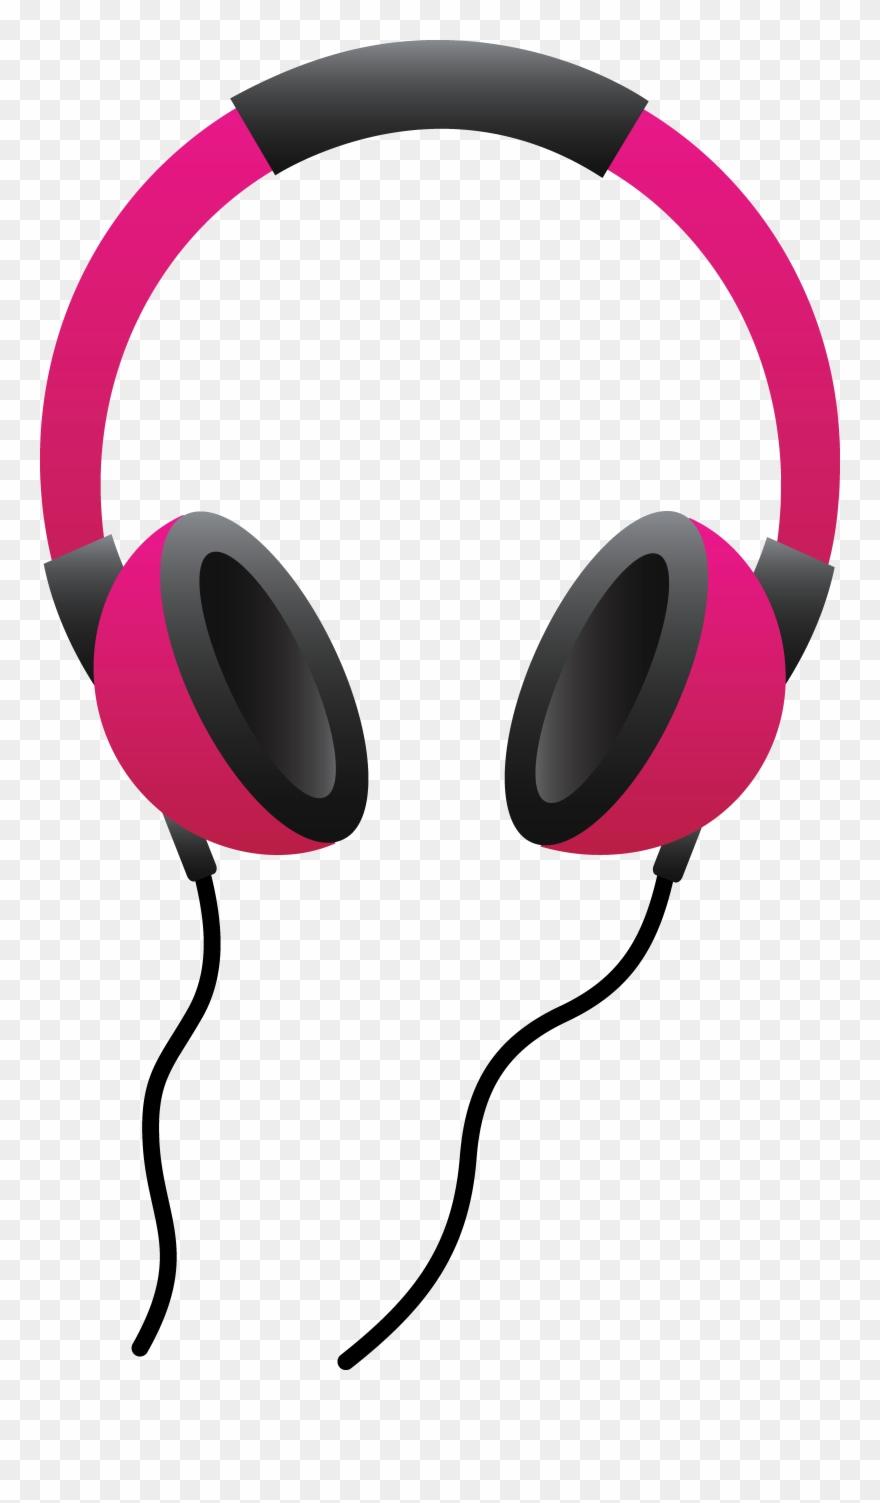 headset # 5117862